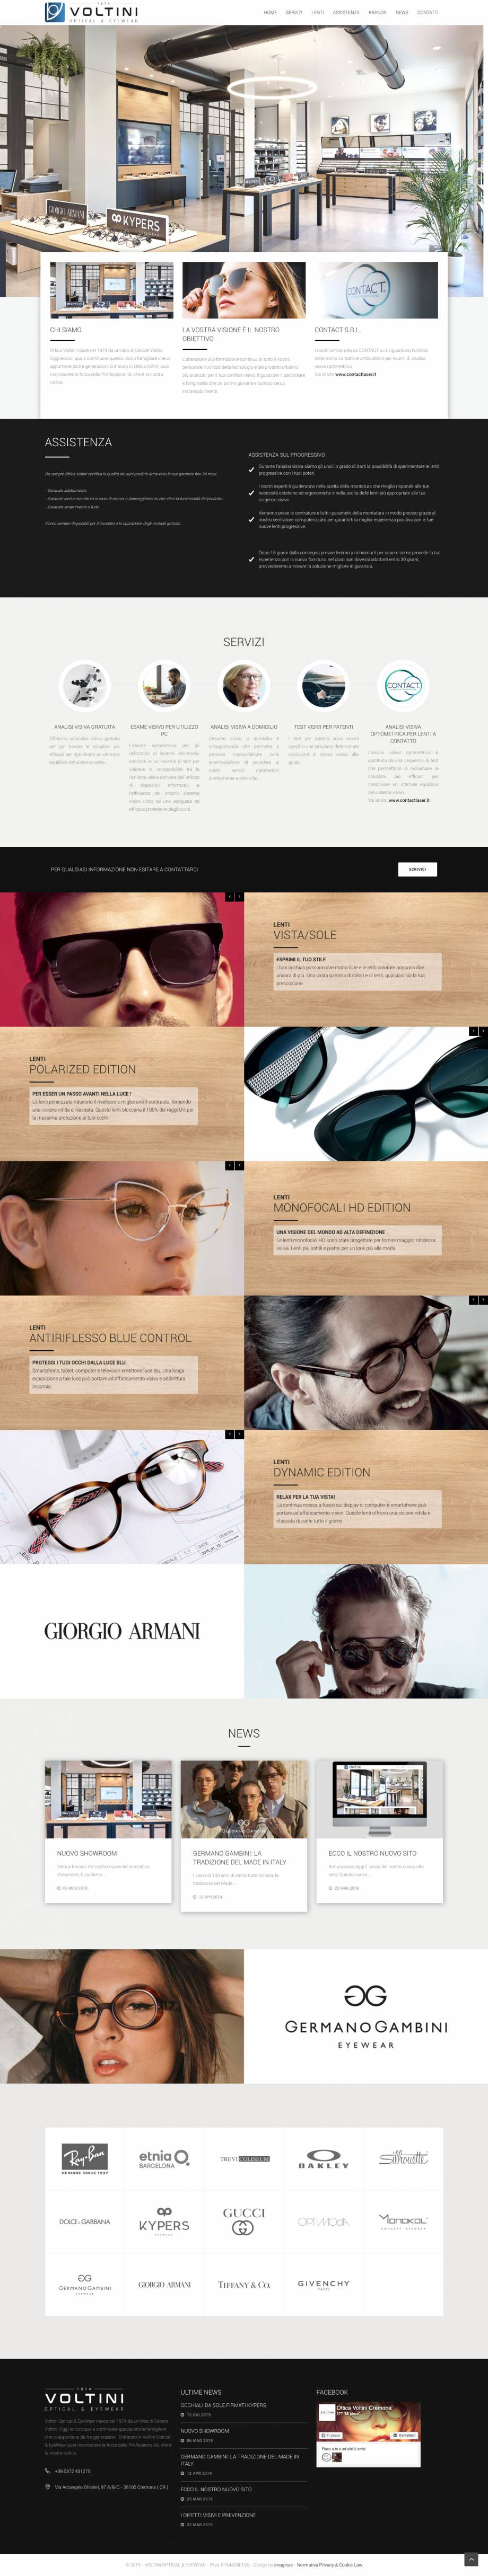 Web Design, Fotografia, Logo Design, Web Site, Stampa, Social Media Strategy, Branding, Responsive Smartphone & Tablet, Campagna Pubblicitaria, Insegne, Immagine Coordinata, Facebook Advertising, Art Direction & Visual Design,